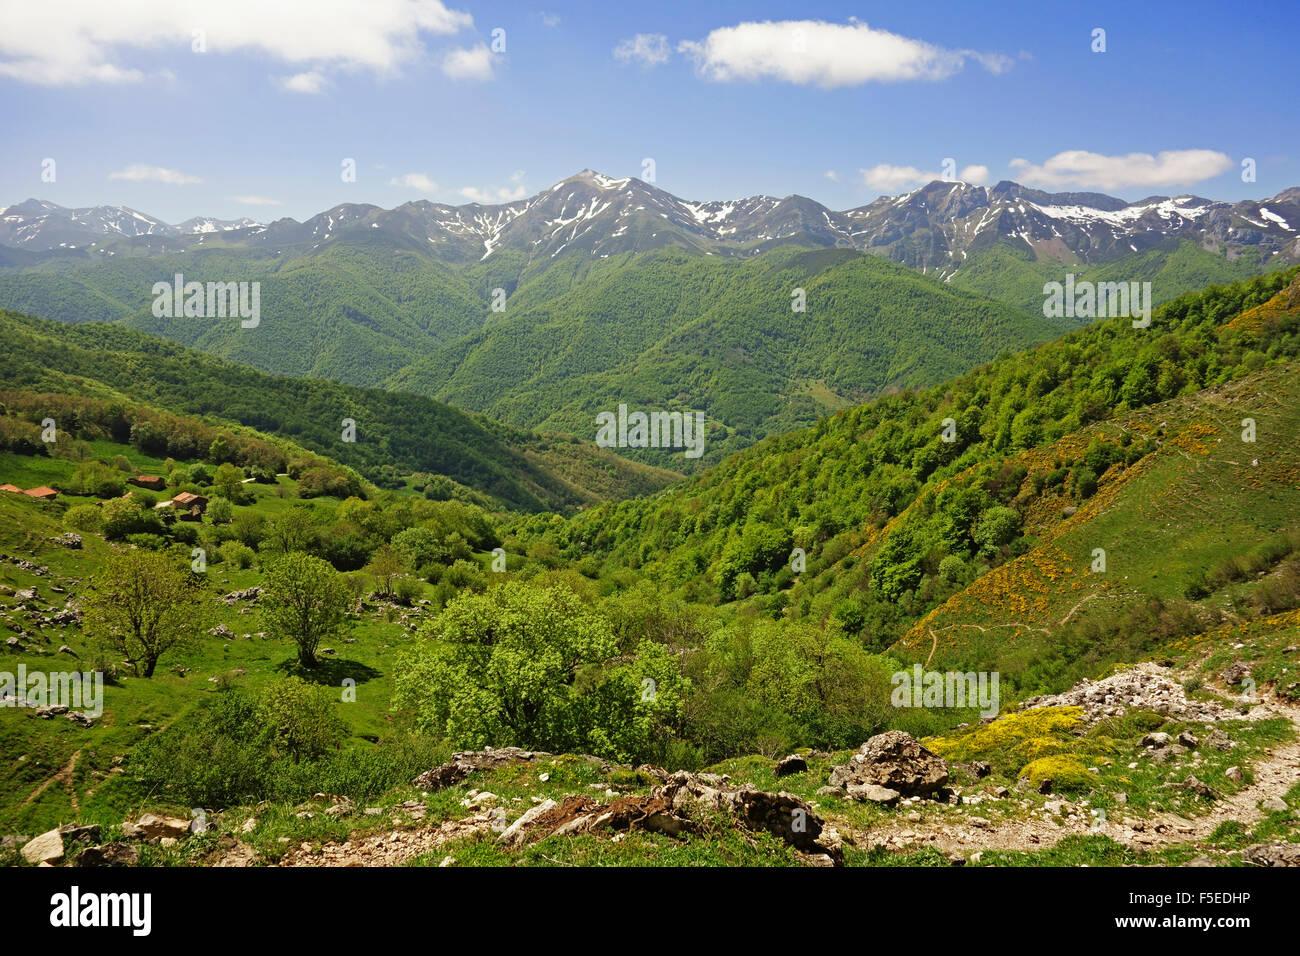 Fuente De, Picos de Europa, Parque Nacional de los Picos de Europa, Asturias, Cantabria, Spain, Europe Photo Stock